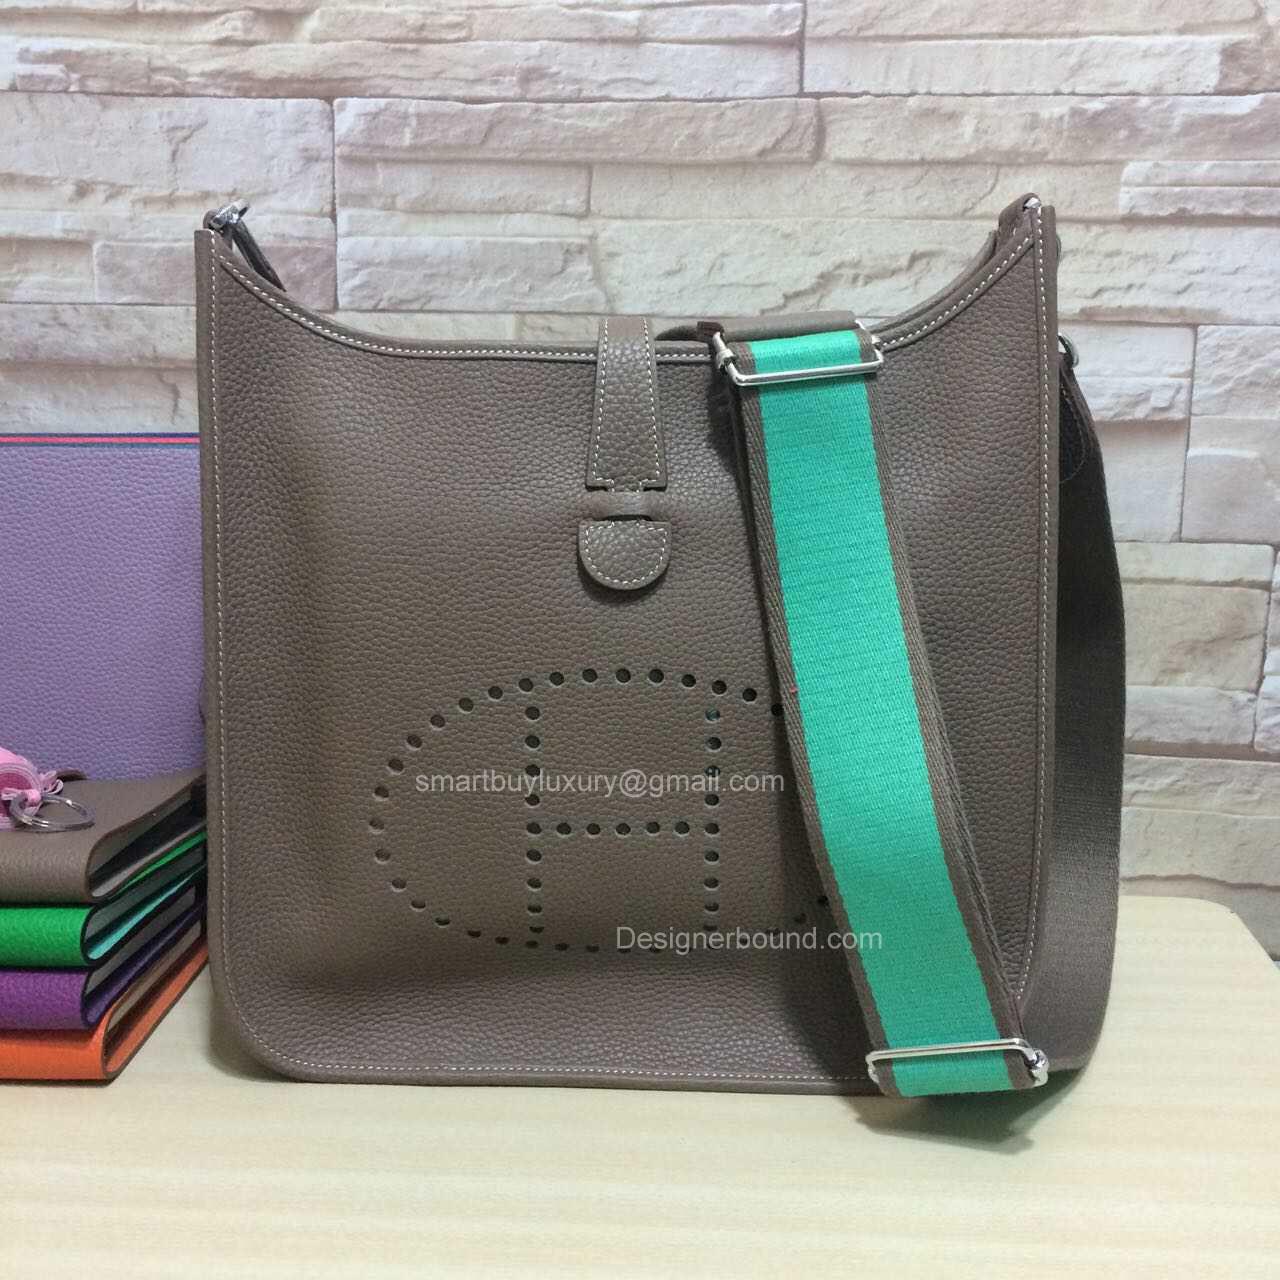 usl briefcase hermes - Hermes Evelyne III Bag PM in Etoupe Togo Leather -